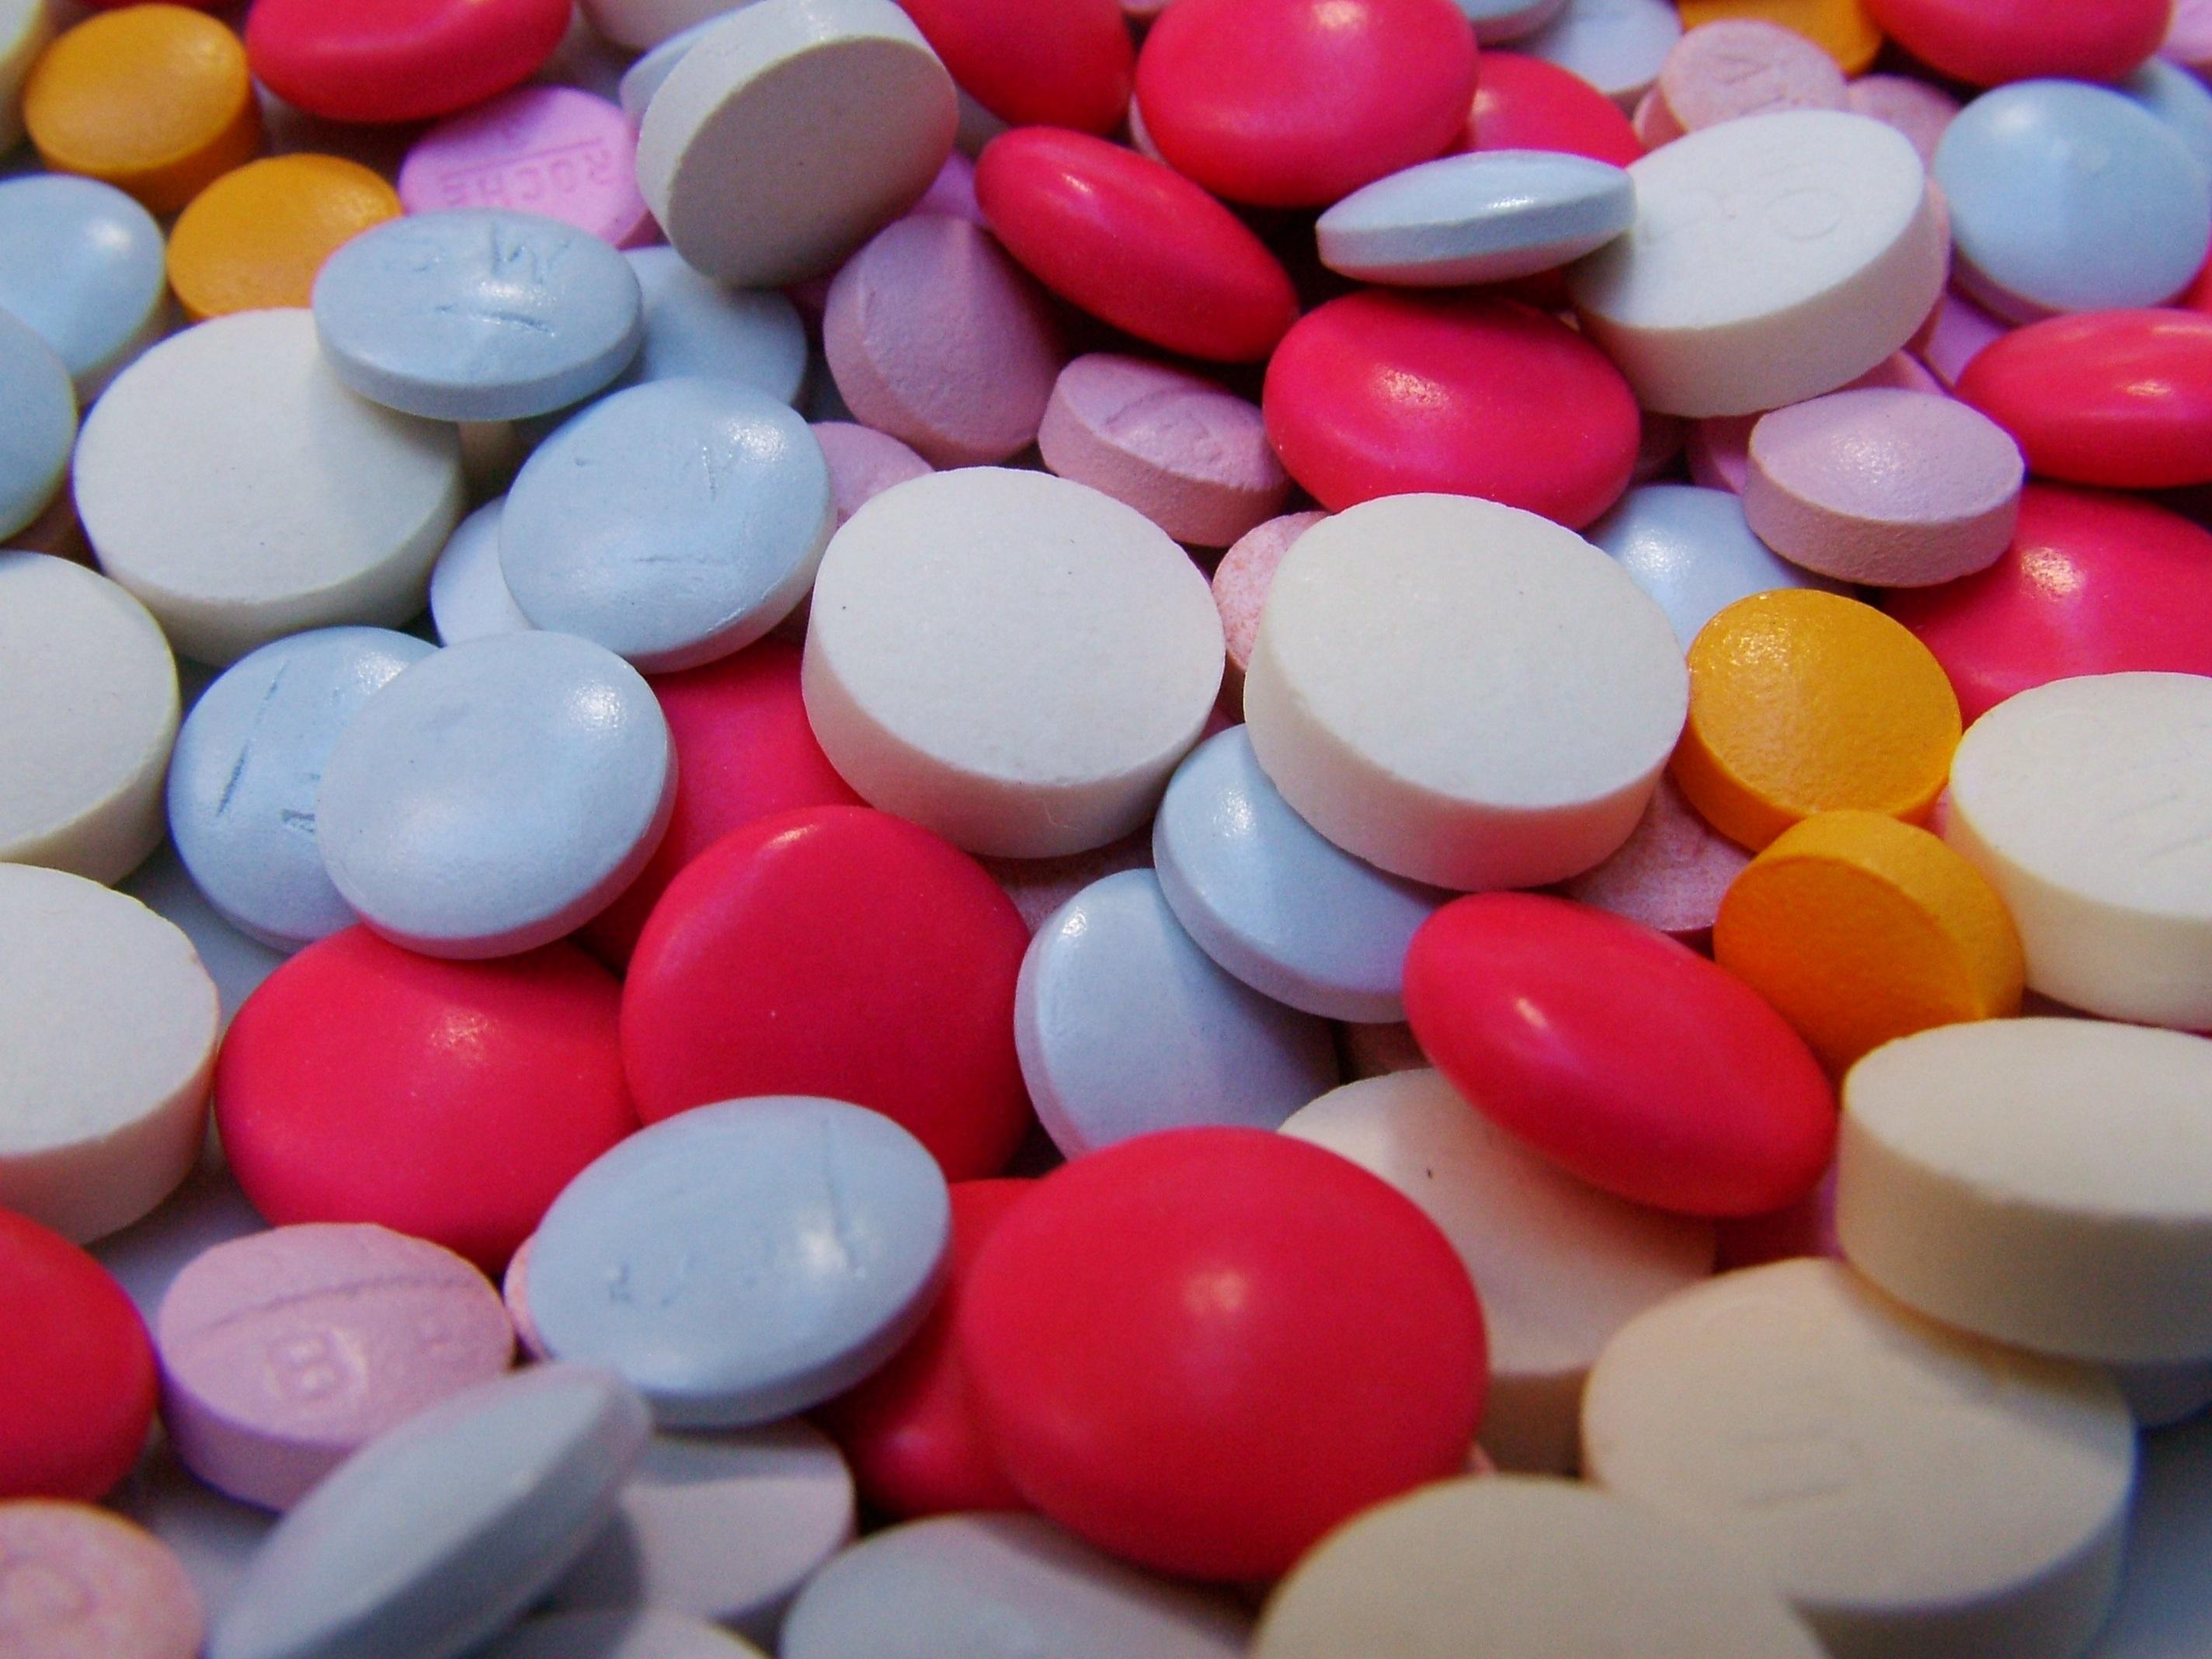 The Dutch & pharma policy: a groundbreaking presidency